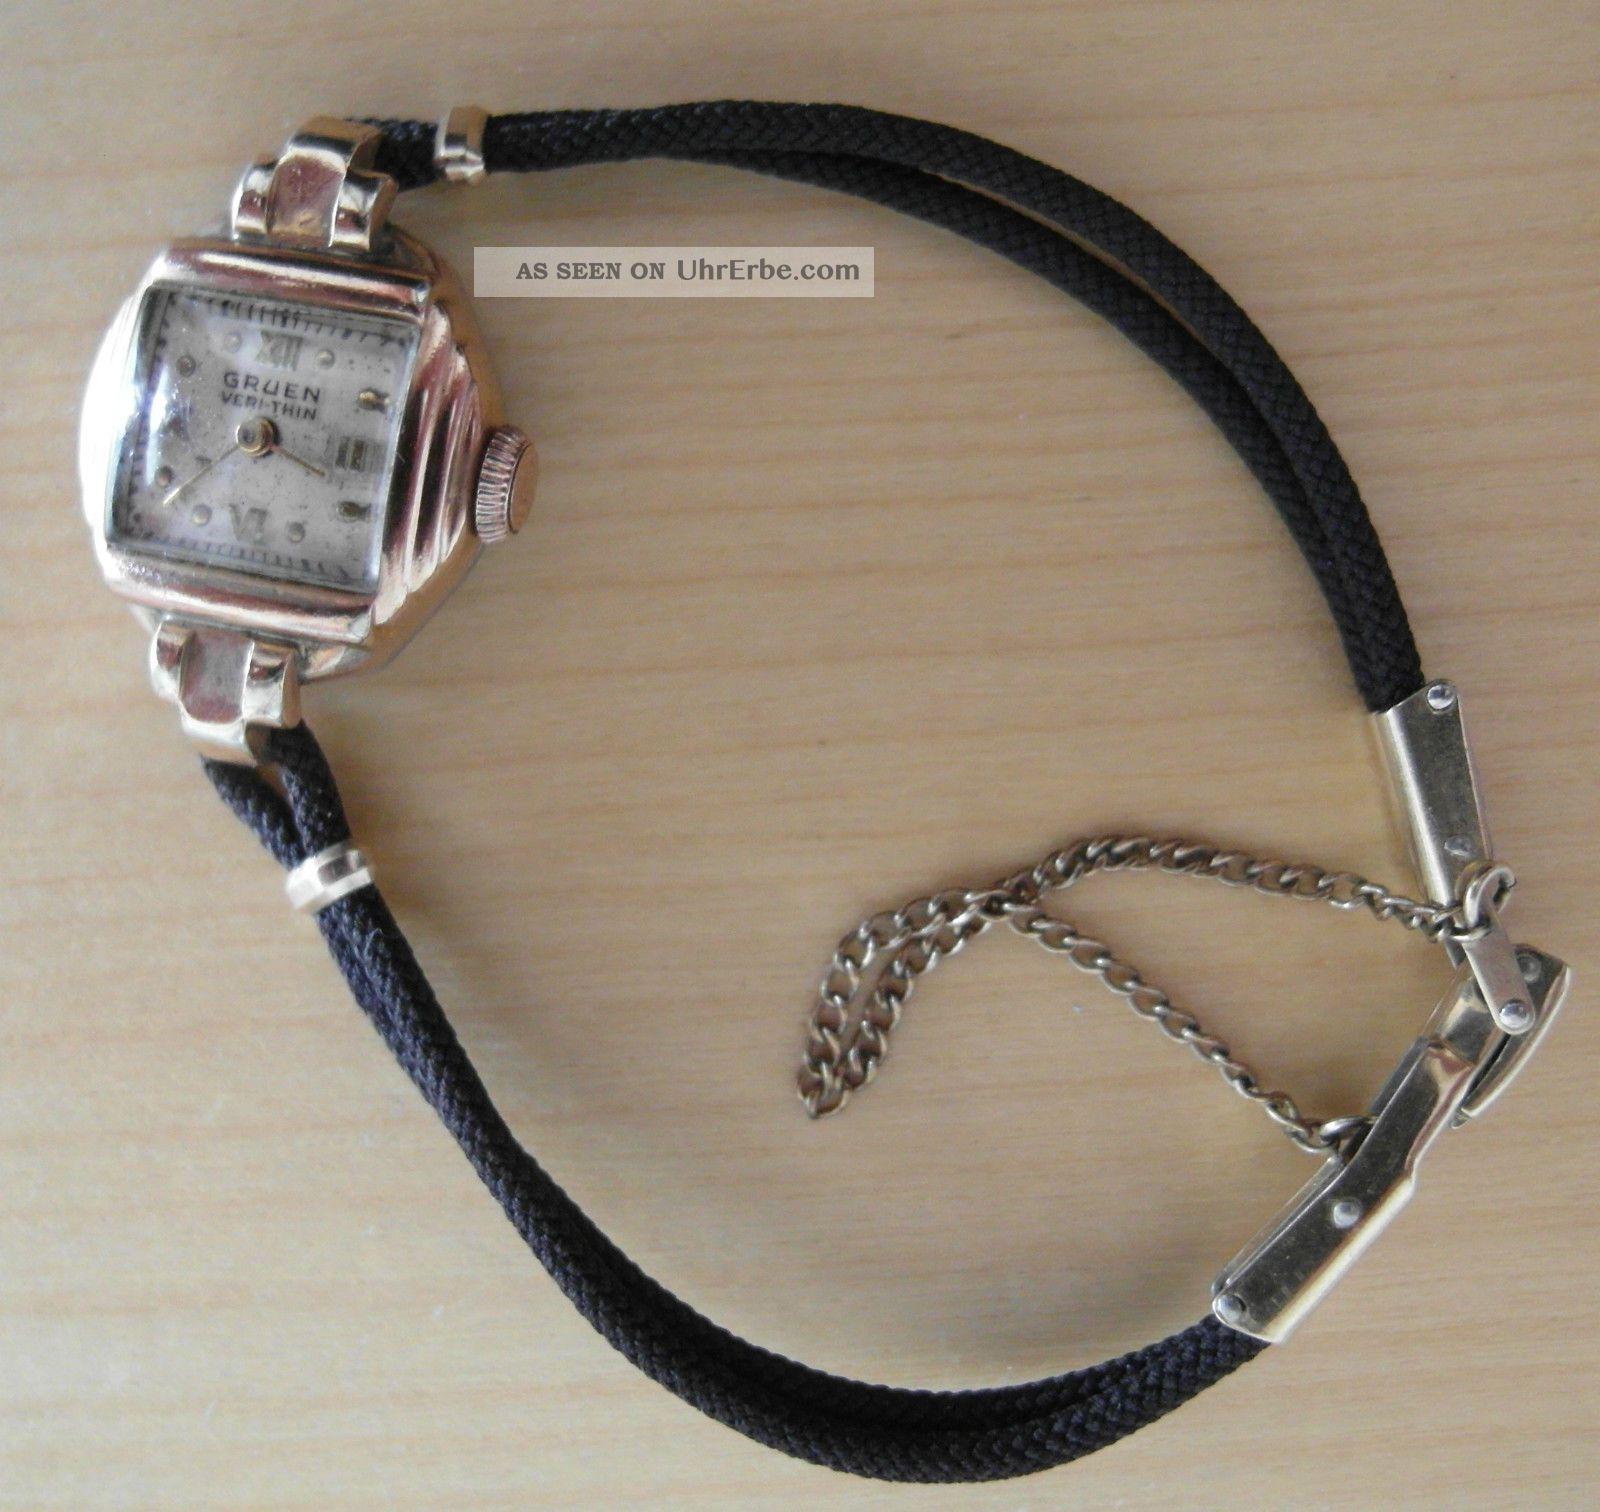 Dau Gruen Very Thin Rotgold Rose Gold Armbanduhren Bild